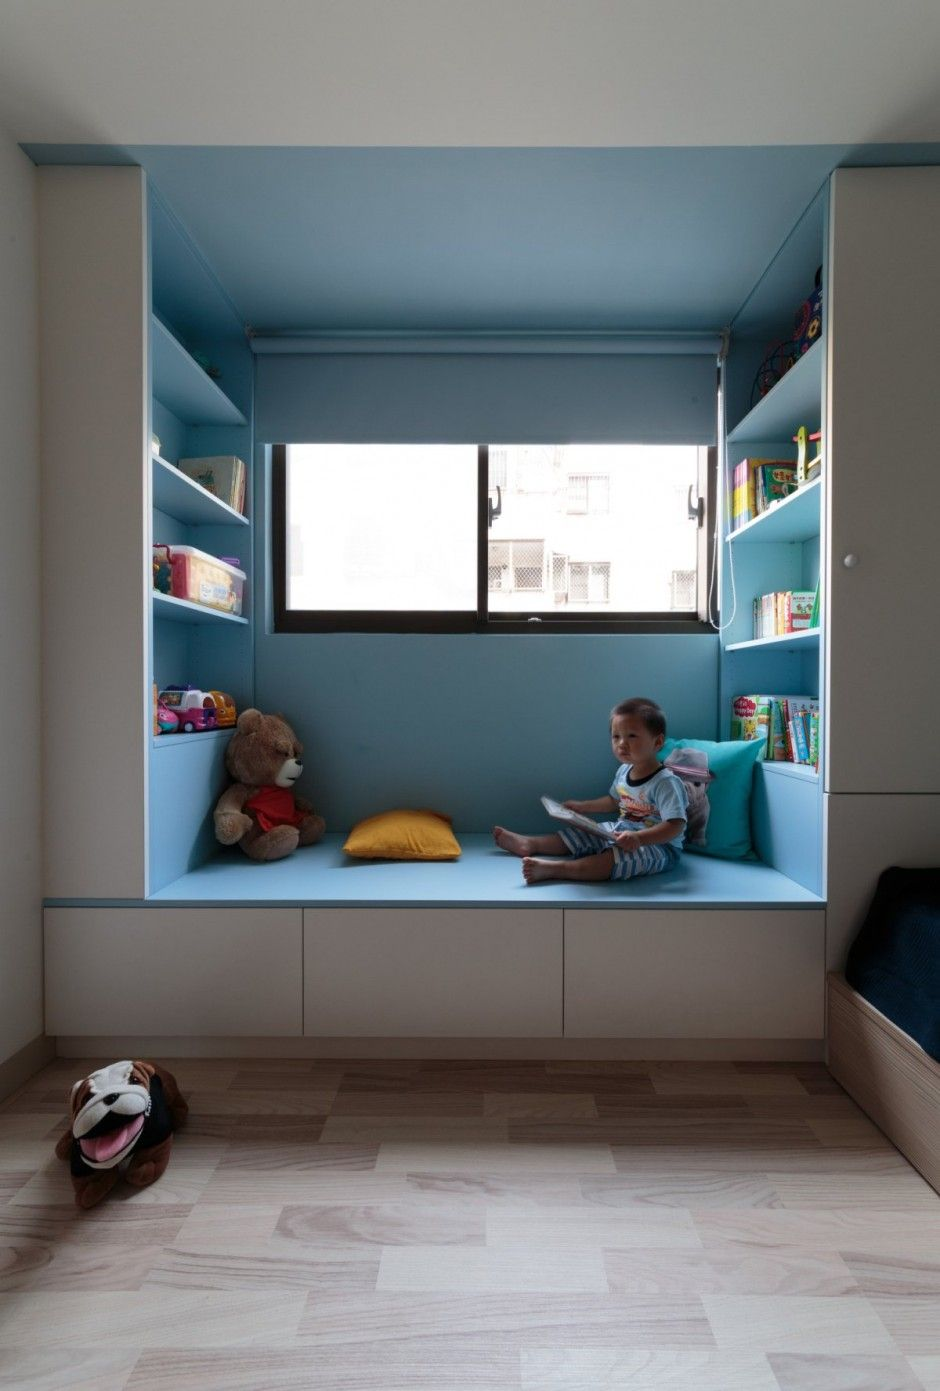 Hd 290414 20 Blue Bedroom Decor Kids Bedroom Decor Bedroom Design